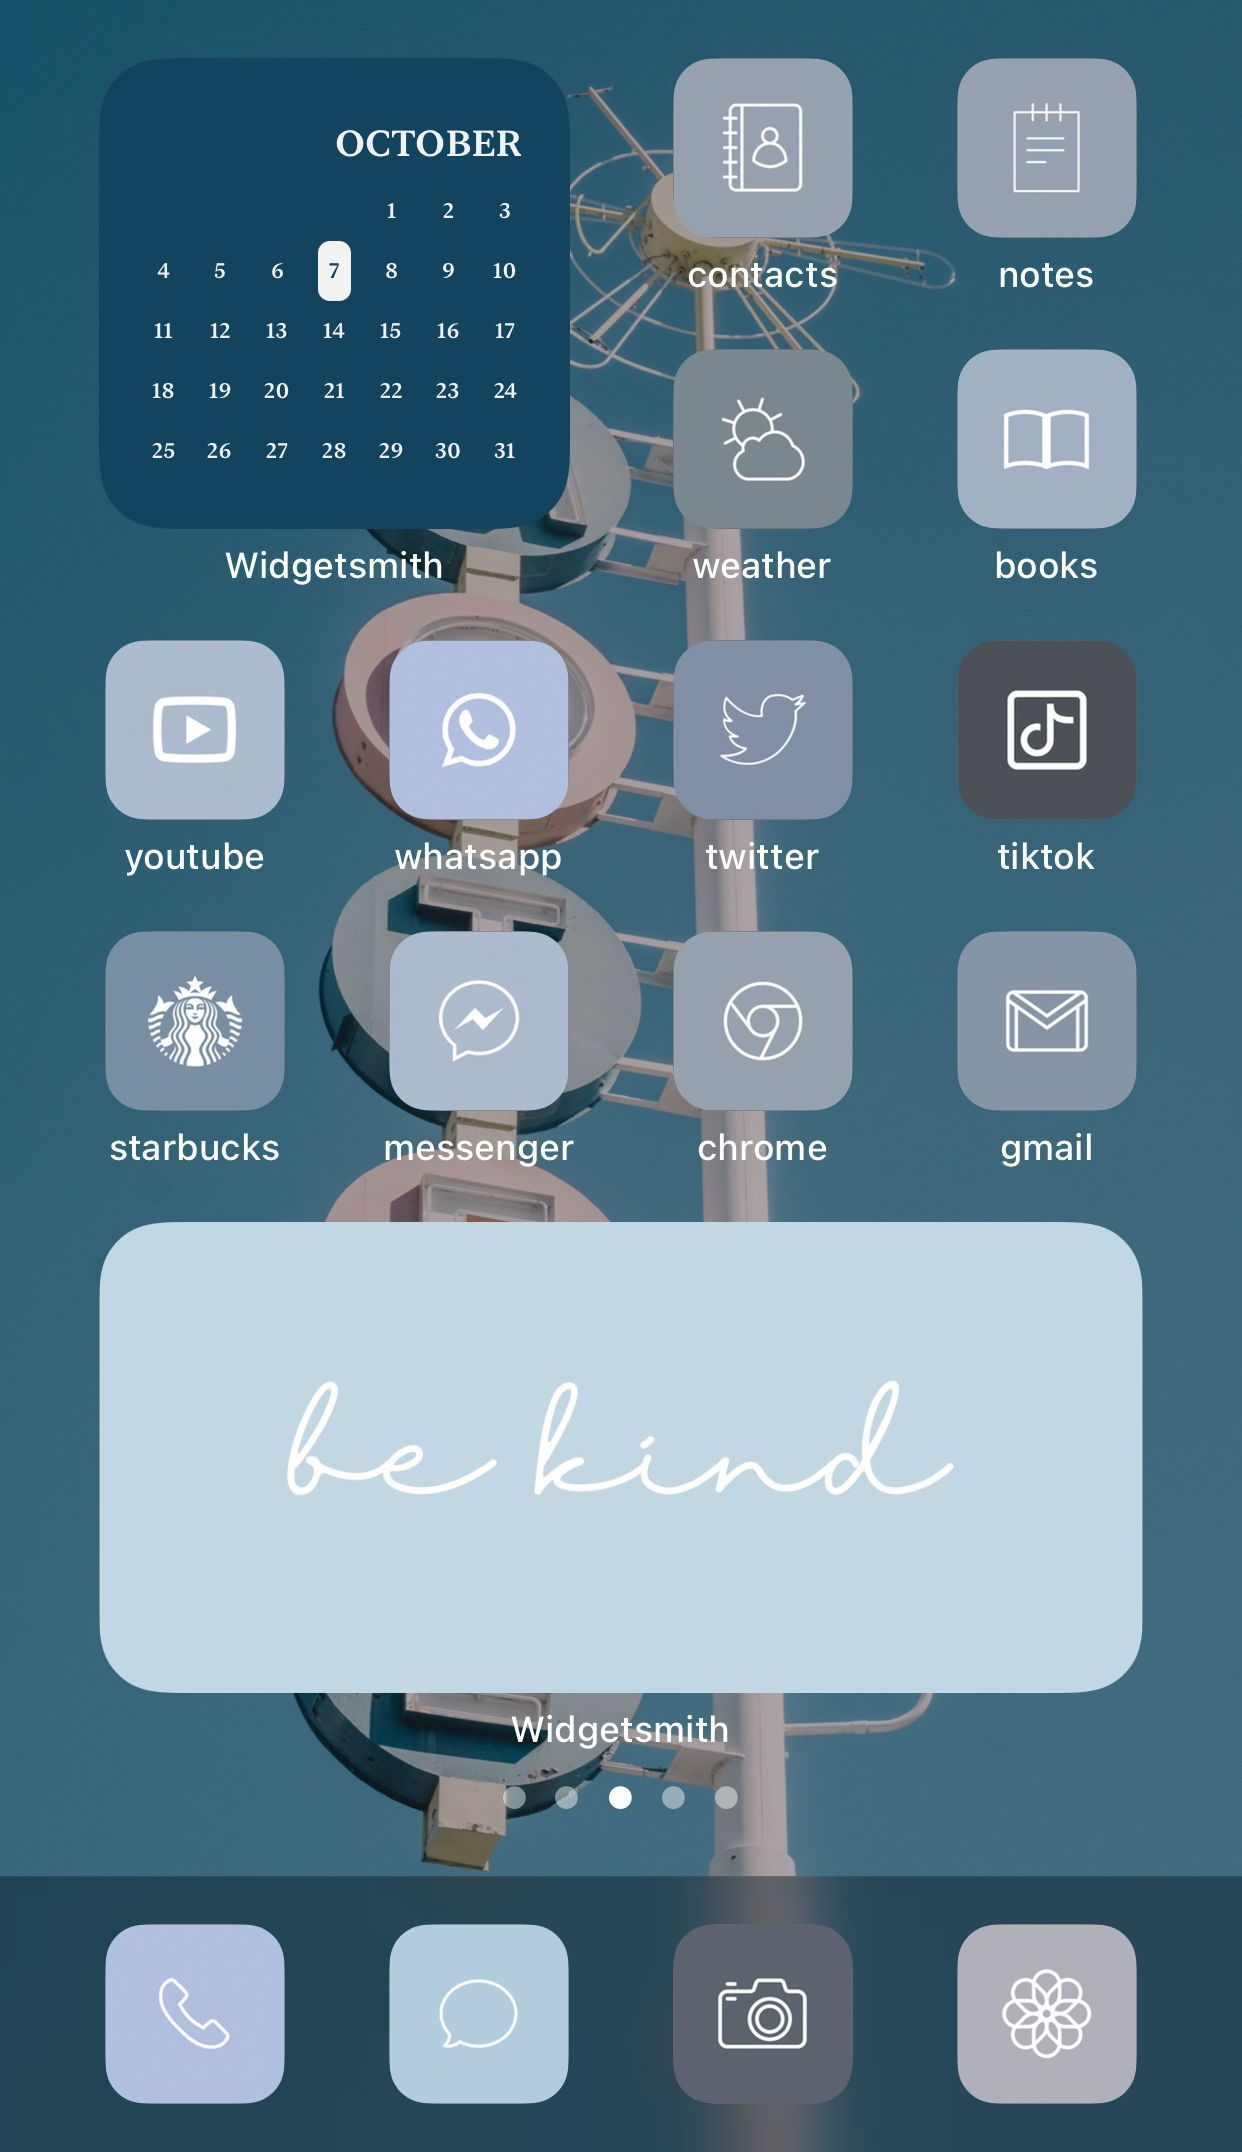 Blue Tones Aesthetic 224 Iphone Ipad Ios 14 App Icons Ios14 Widget Photos Widgetsmith Shortcuts Ios Widget Covers Ios 14 Icon Pack Homescreen App Icon Ios